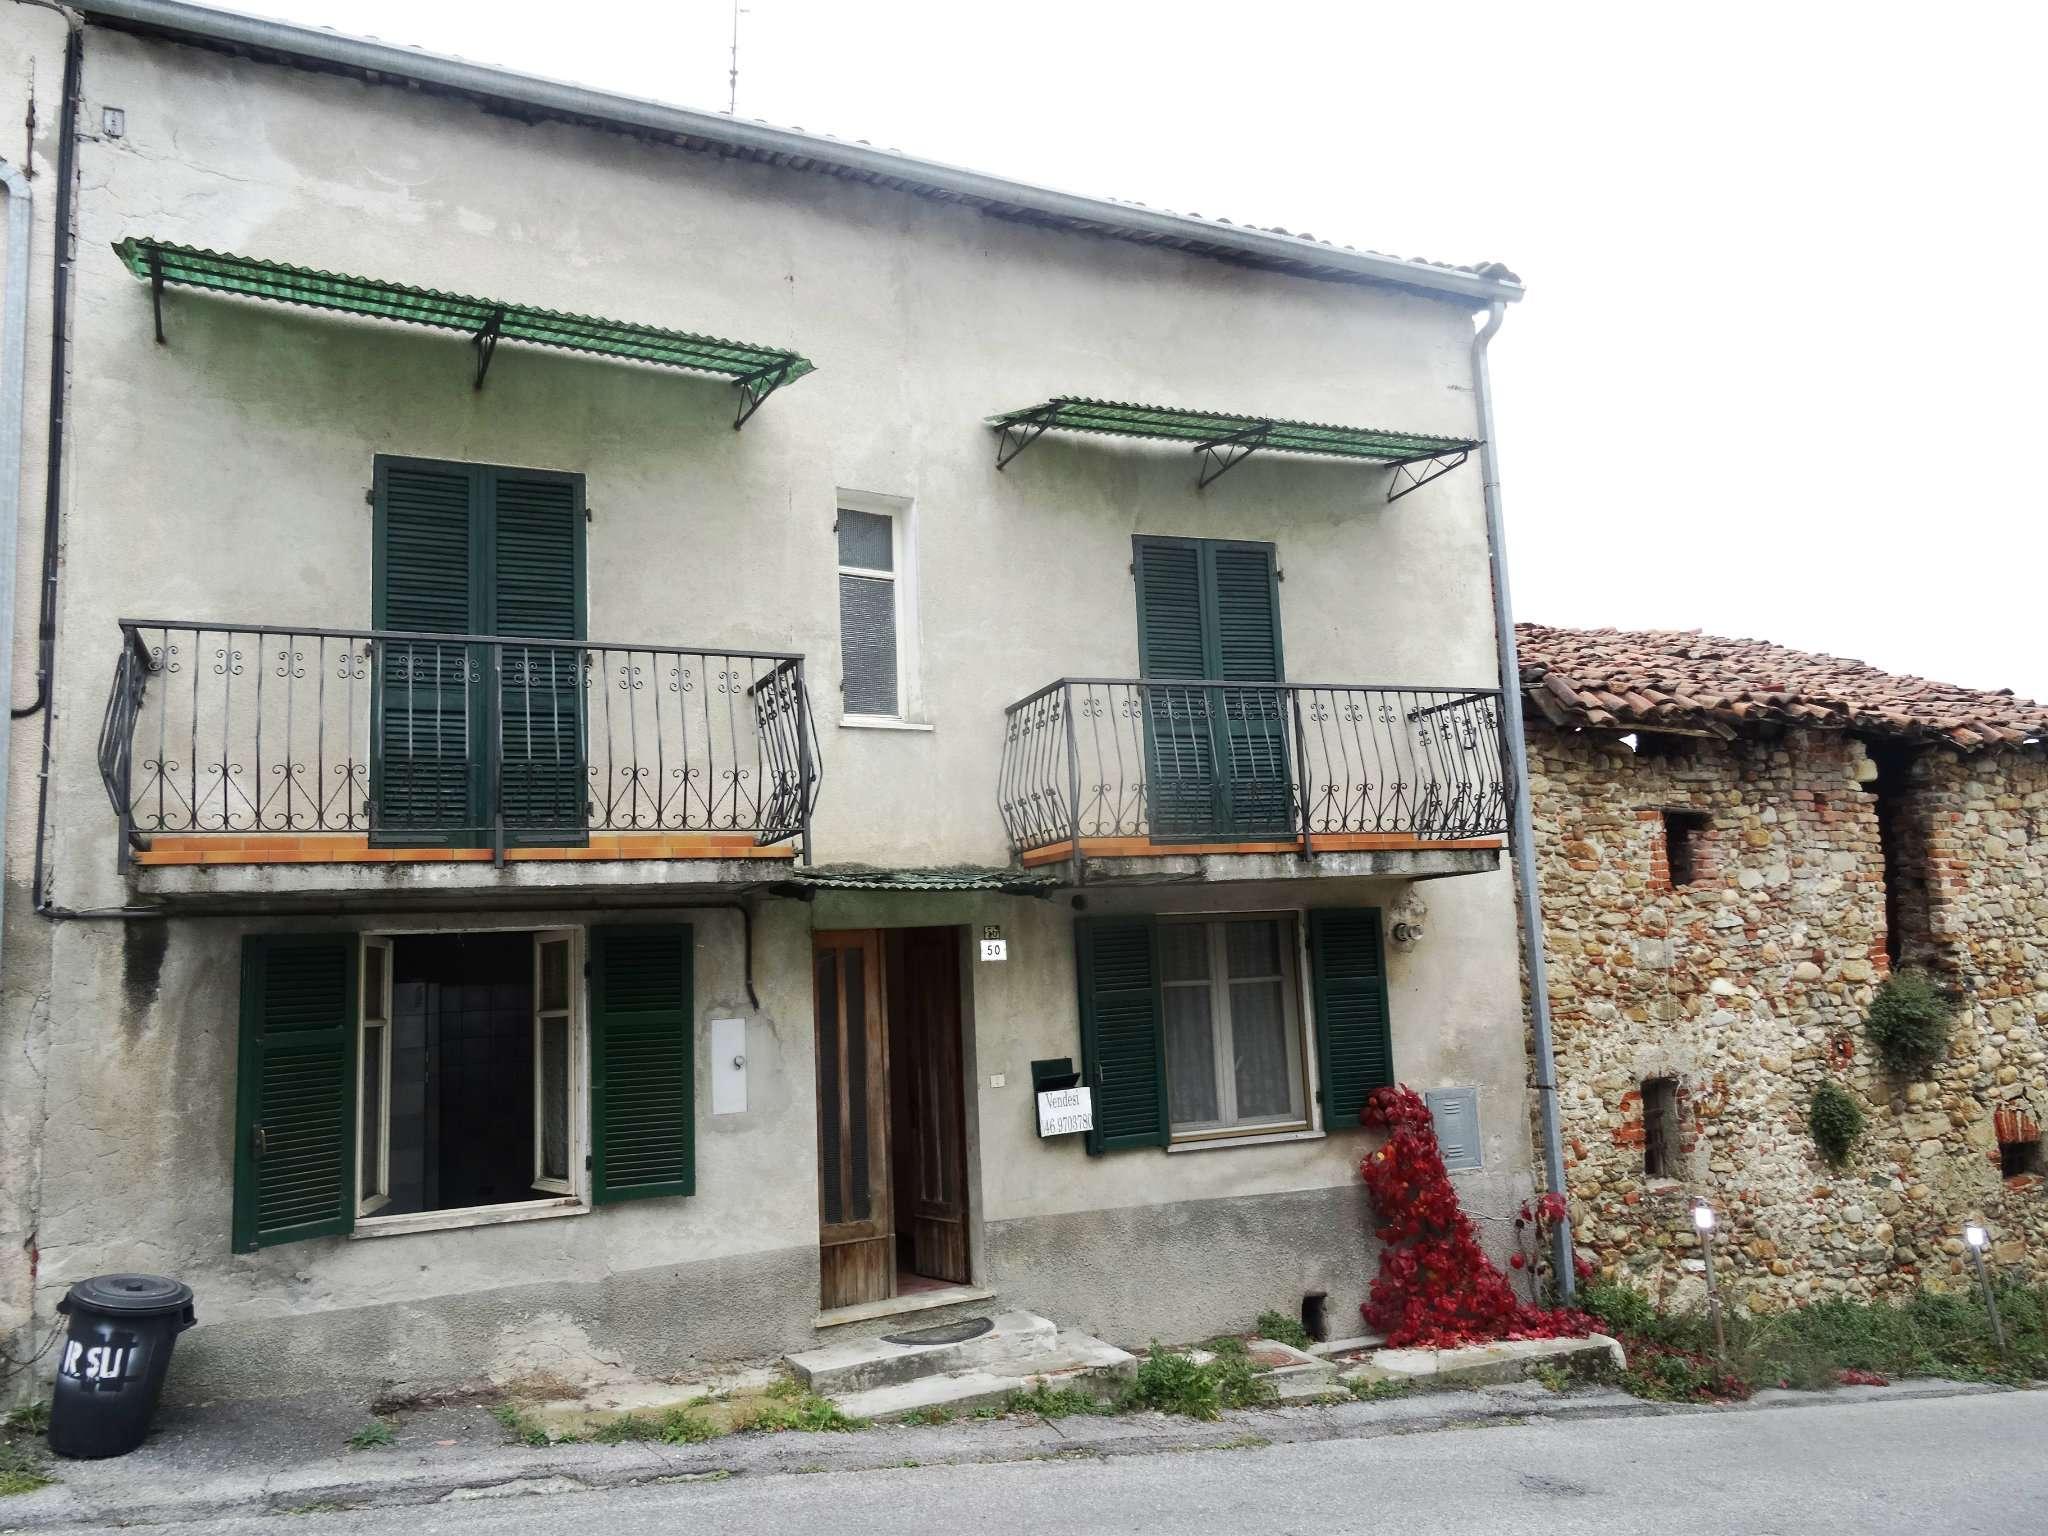 Soluzione Semindipendente in Vendita a San Michele Mondovì